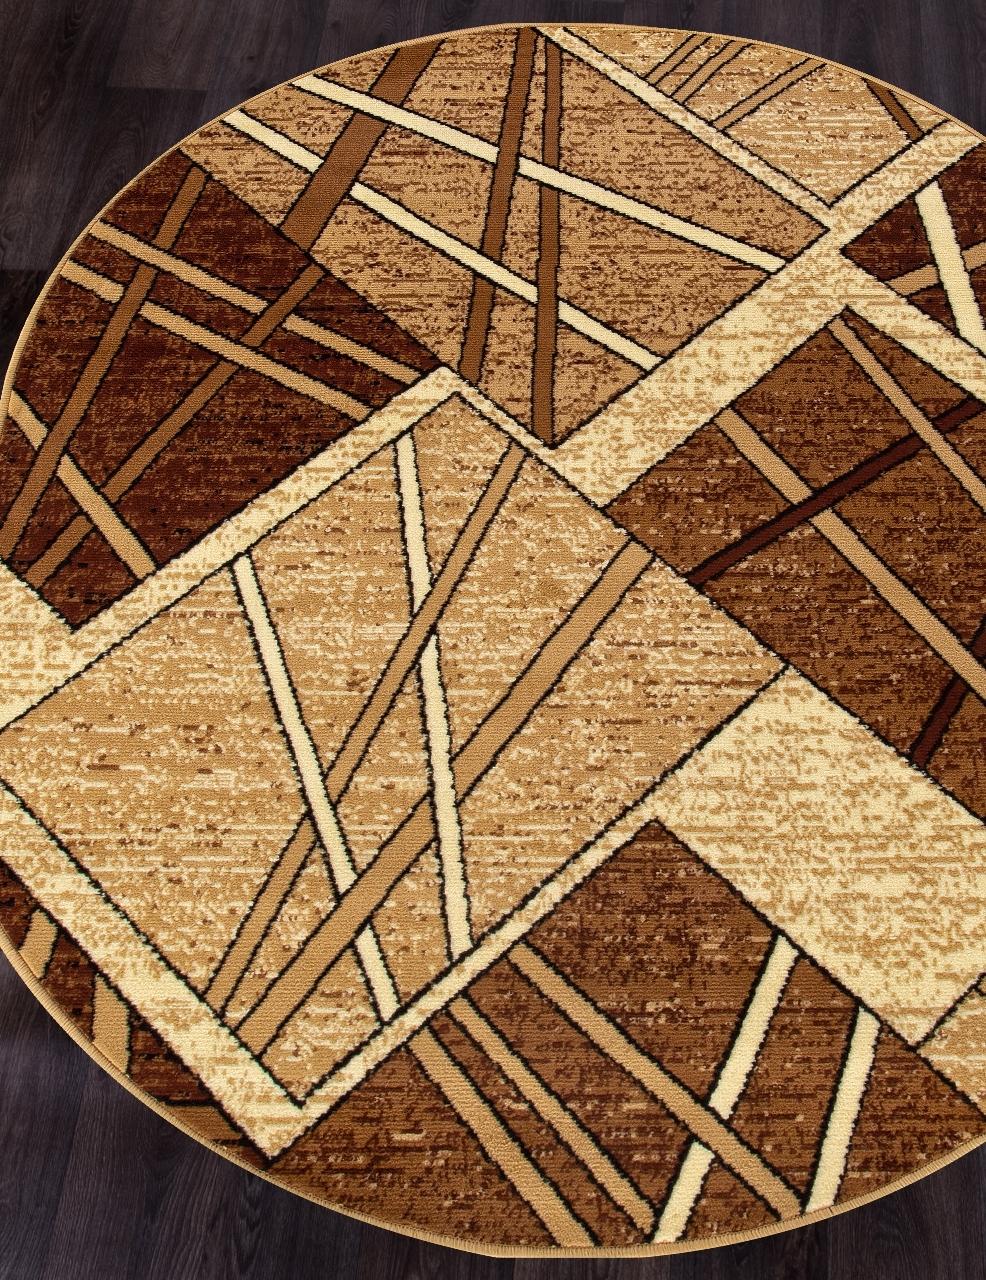 Ковер D487 - BEIGE - Овал - коллекция LAGUNA - фото 1